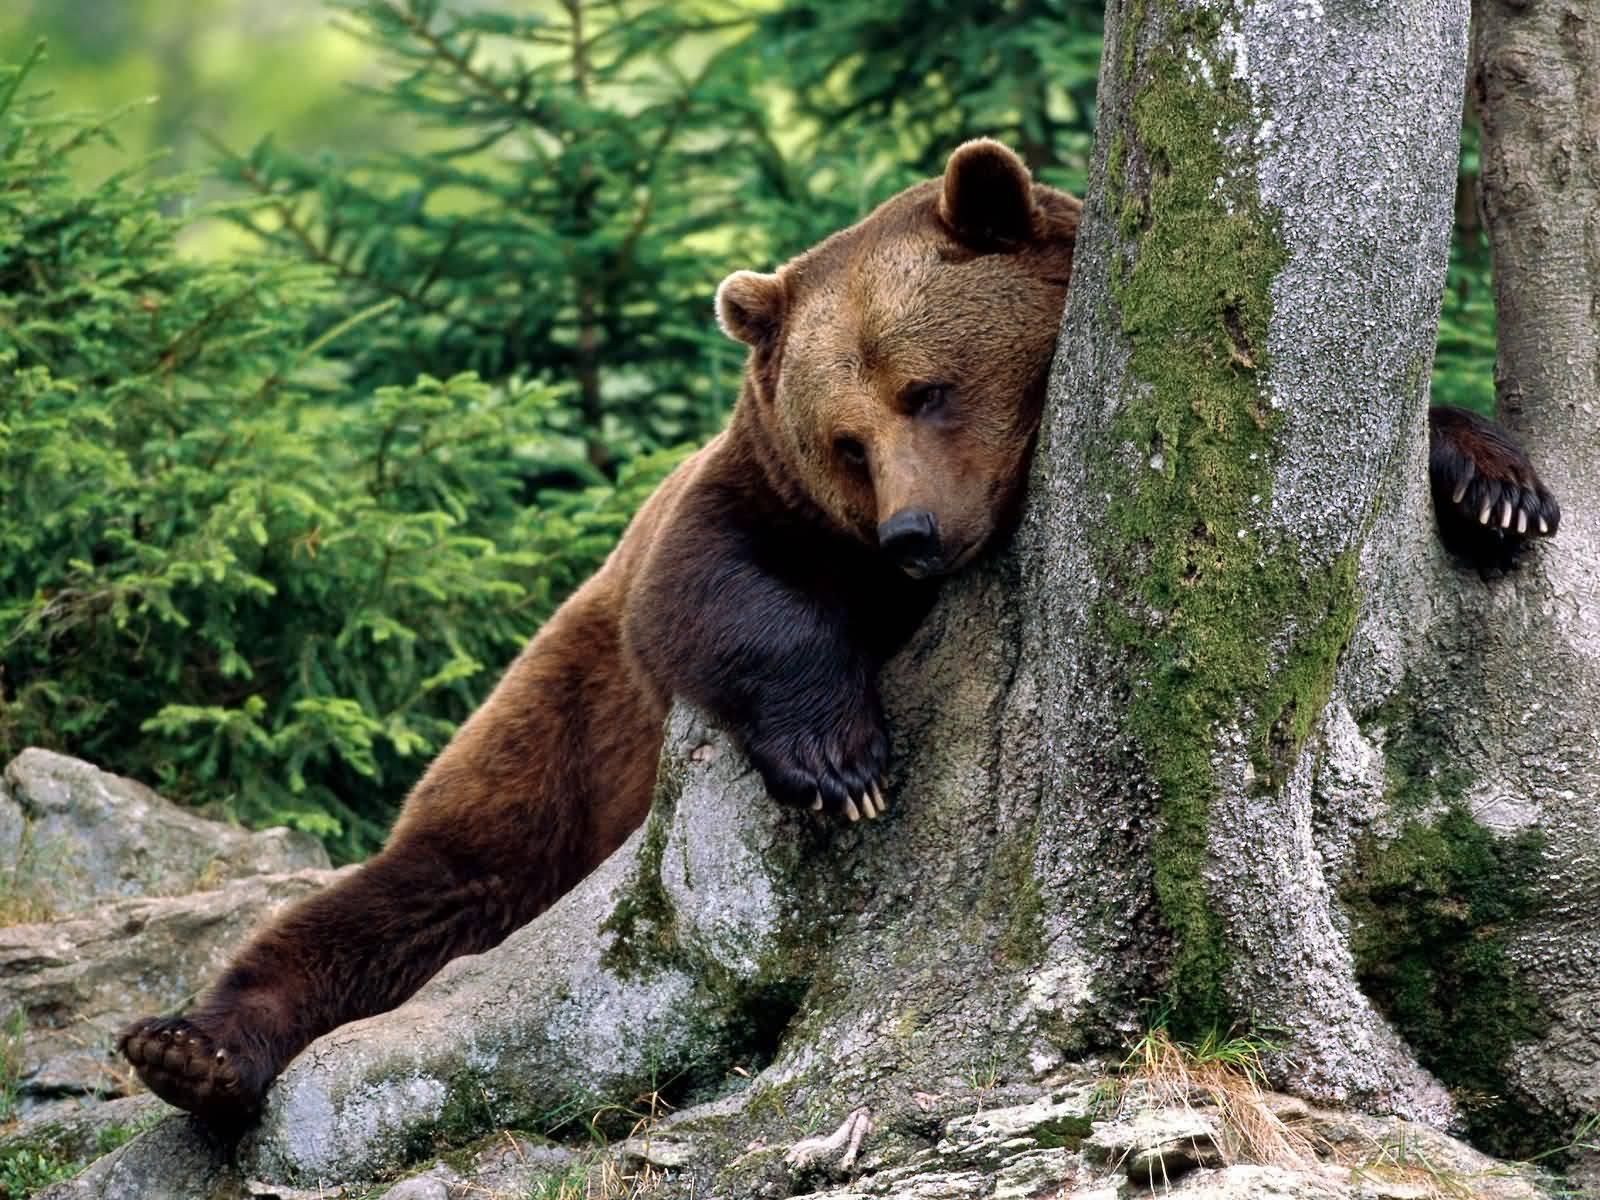 Tired bear photo